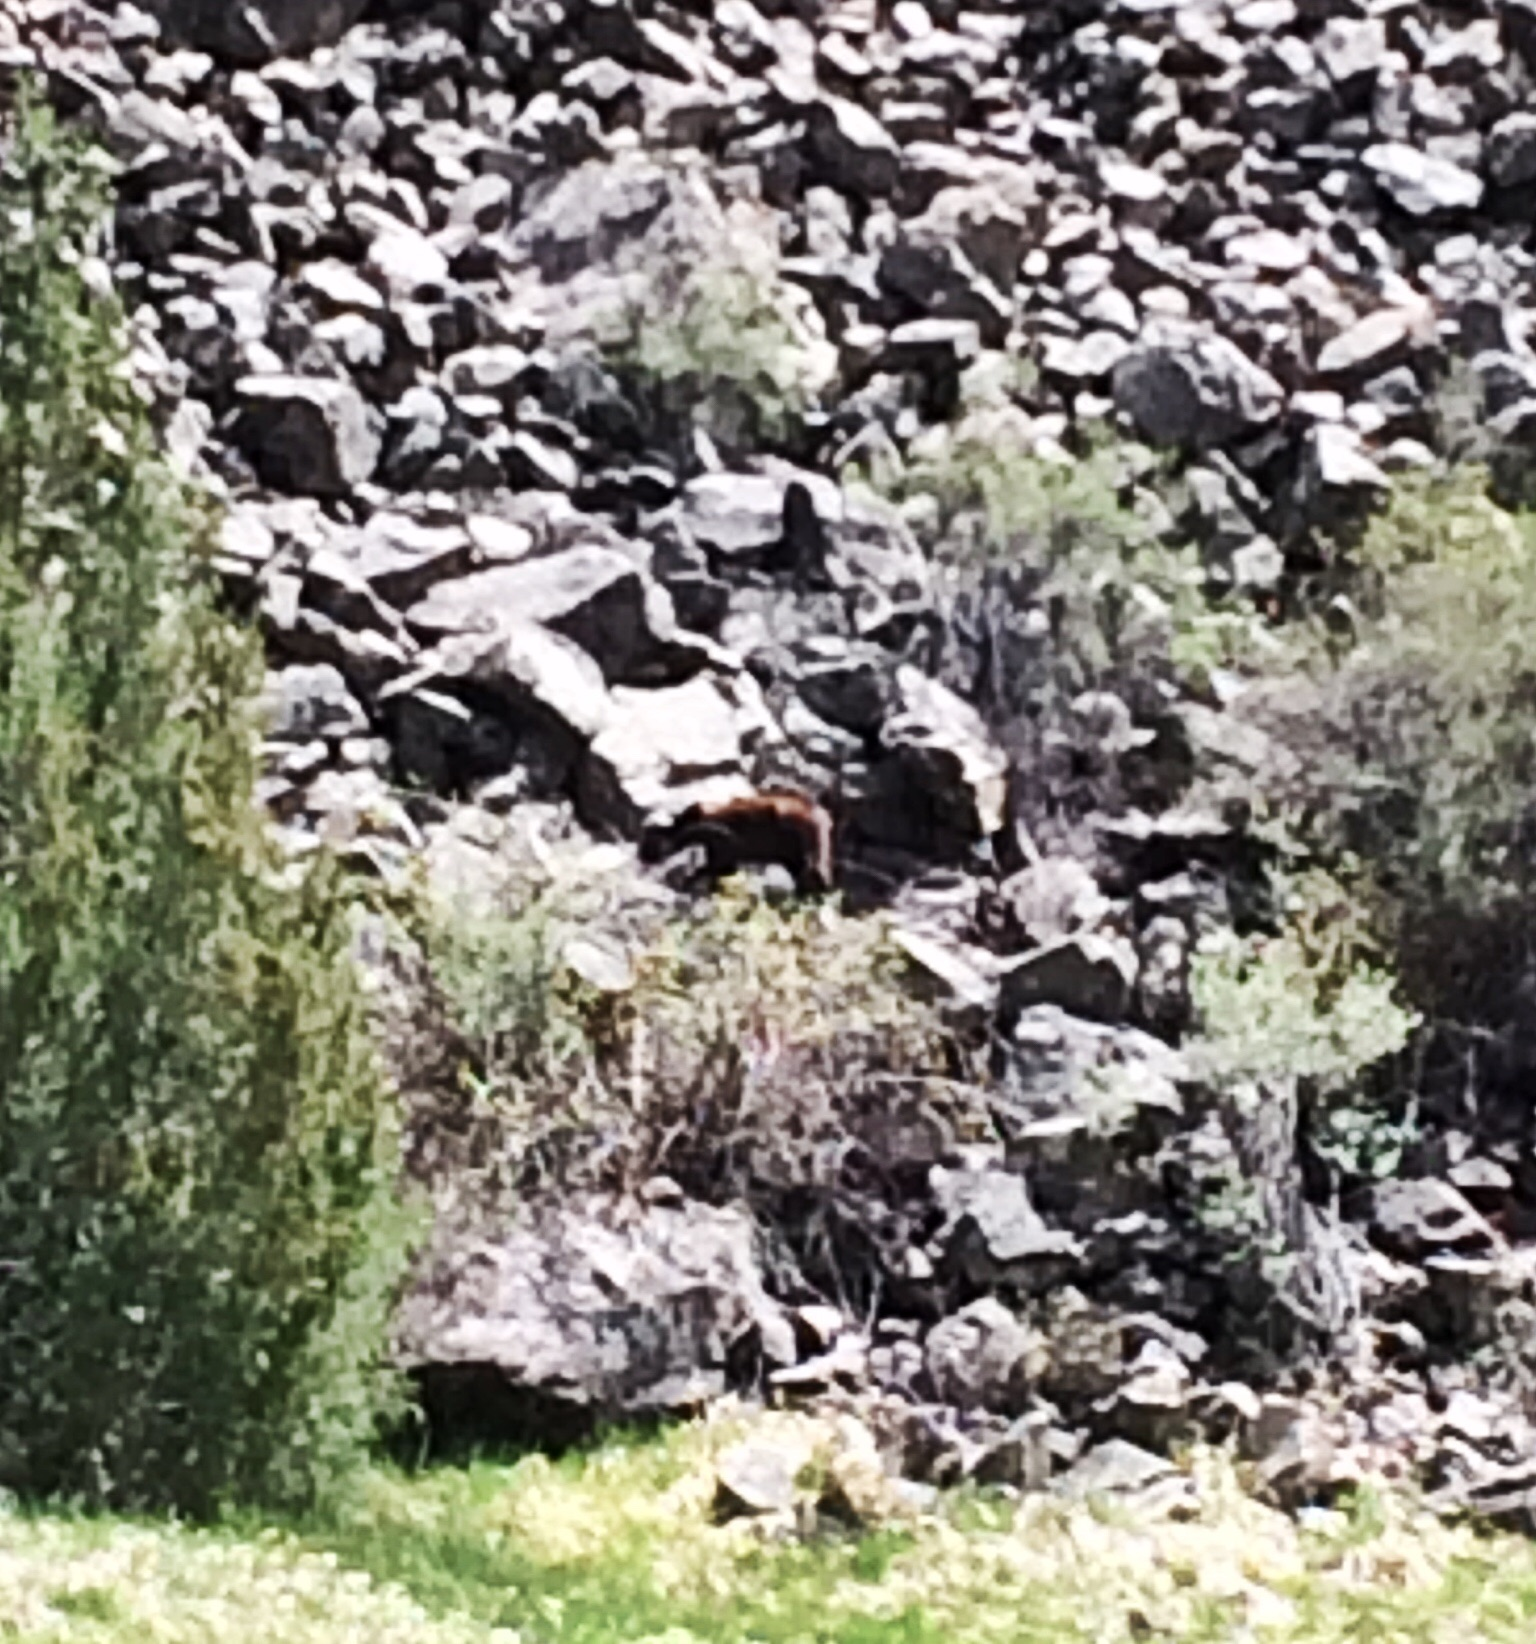 Cinnamon colored black bear, on the rocks, 30 yards across the river.